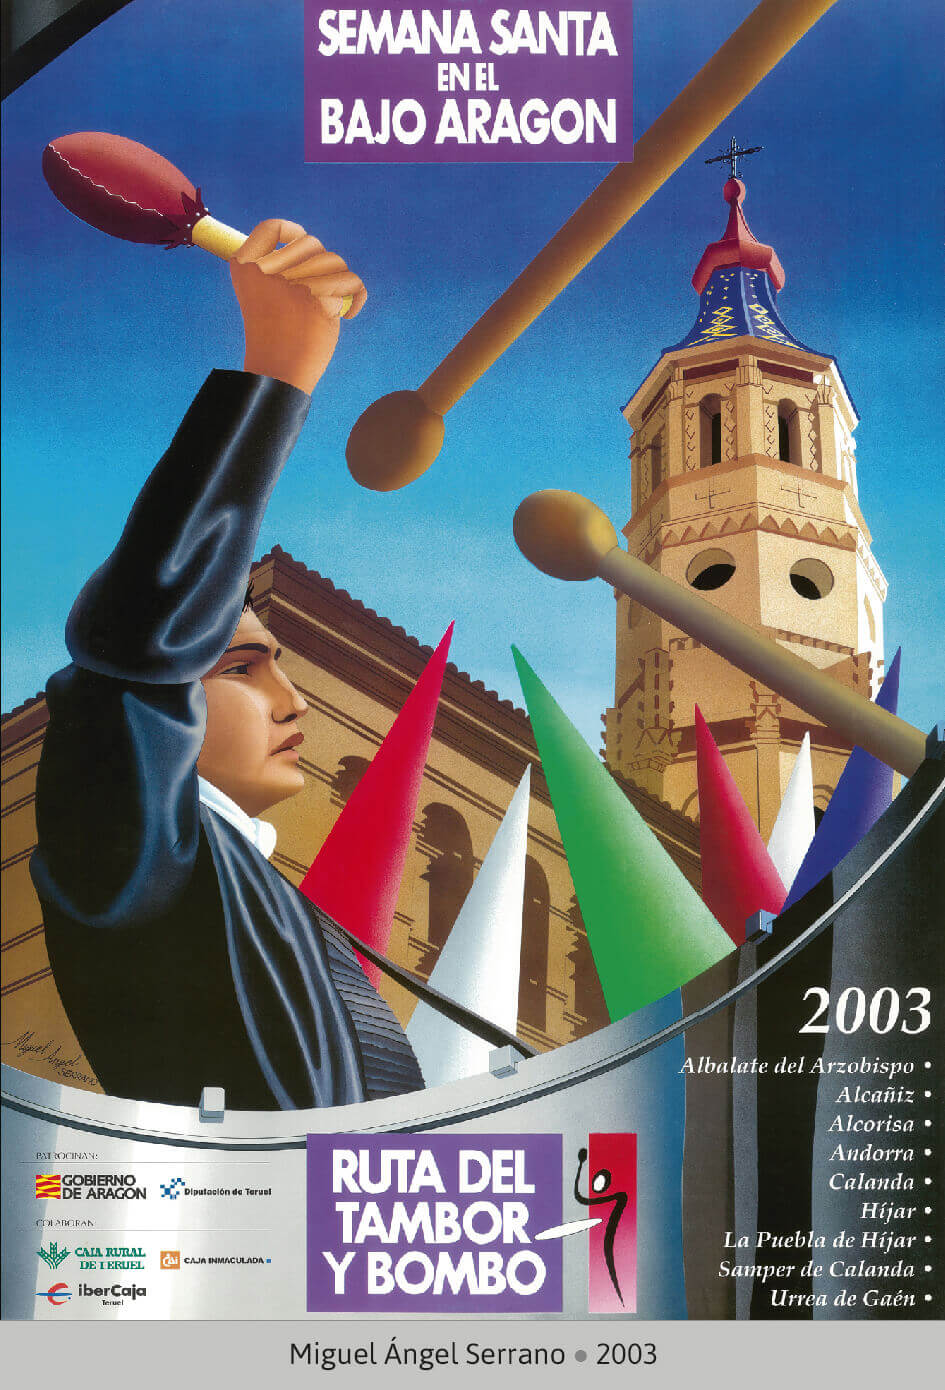 Cartel Ganador Ruta del Tambor y Bombo. Semana Santa 2003